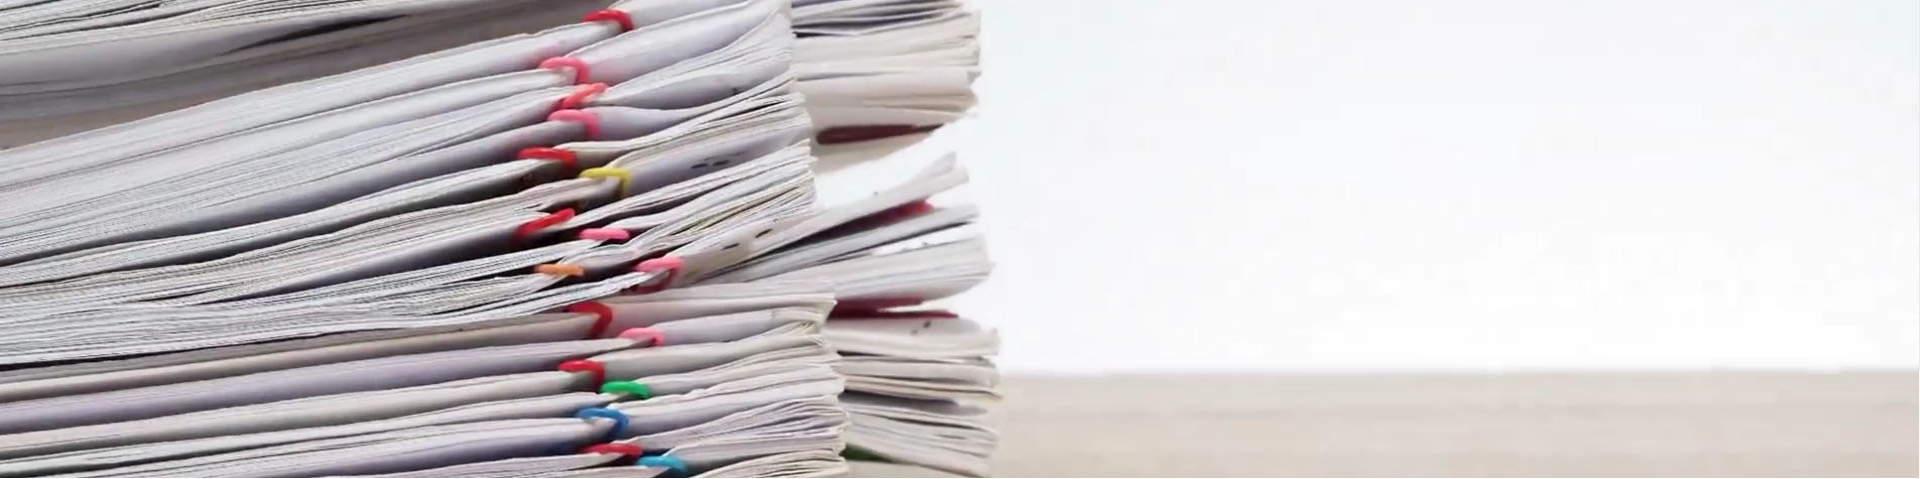 personalfragebogen minijob datev 2019